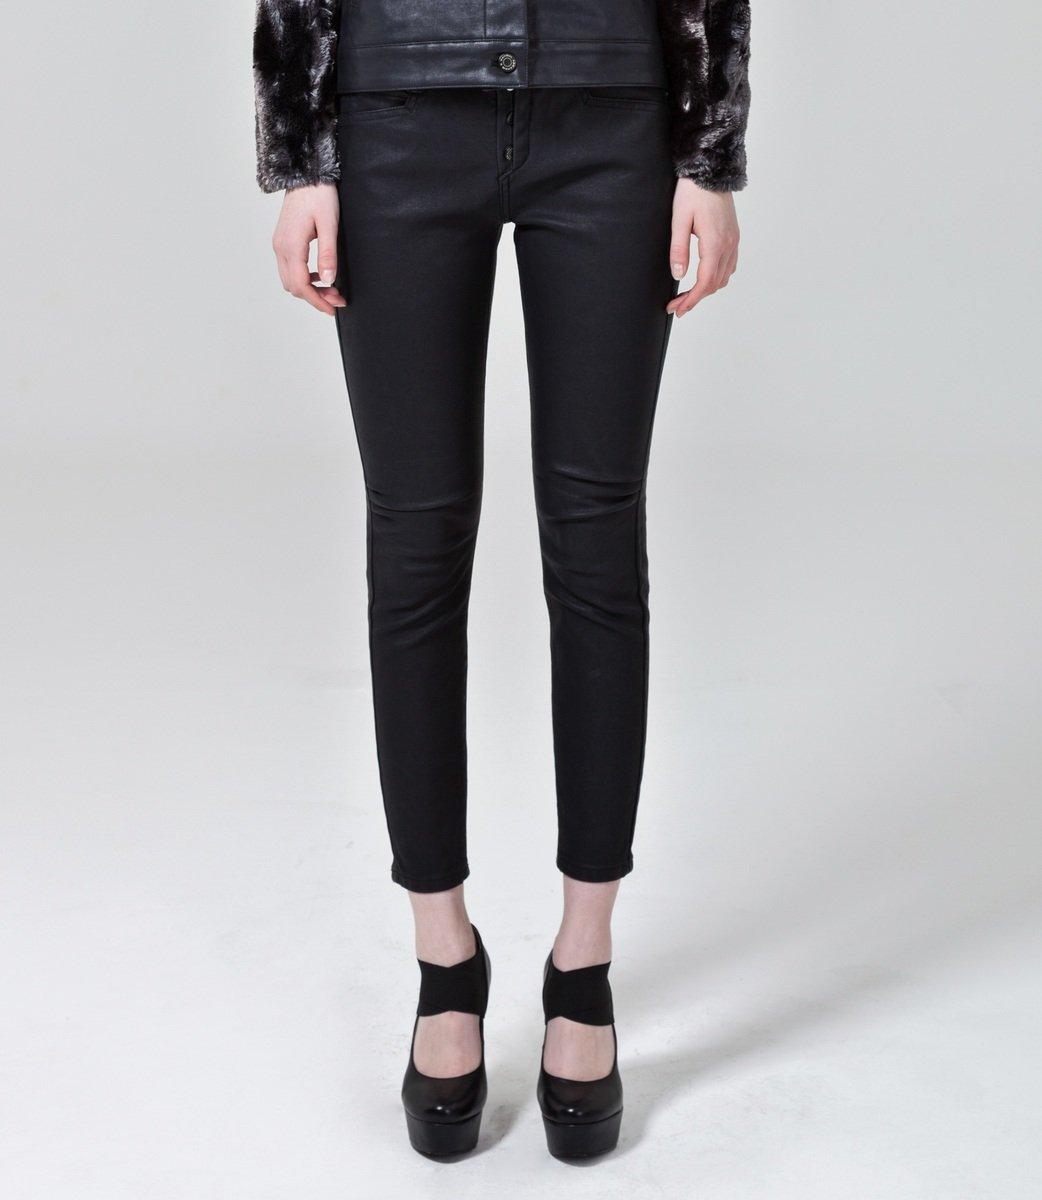 AKH15FW21 黑色修身牛仔褲